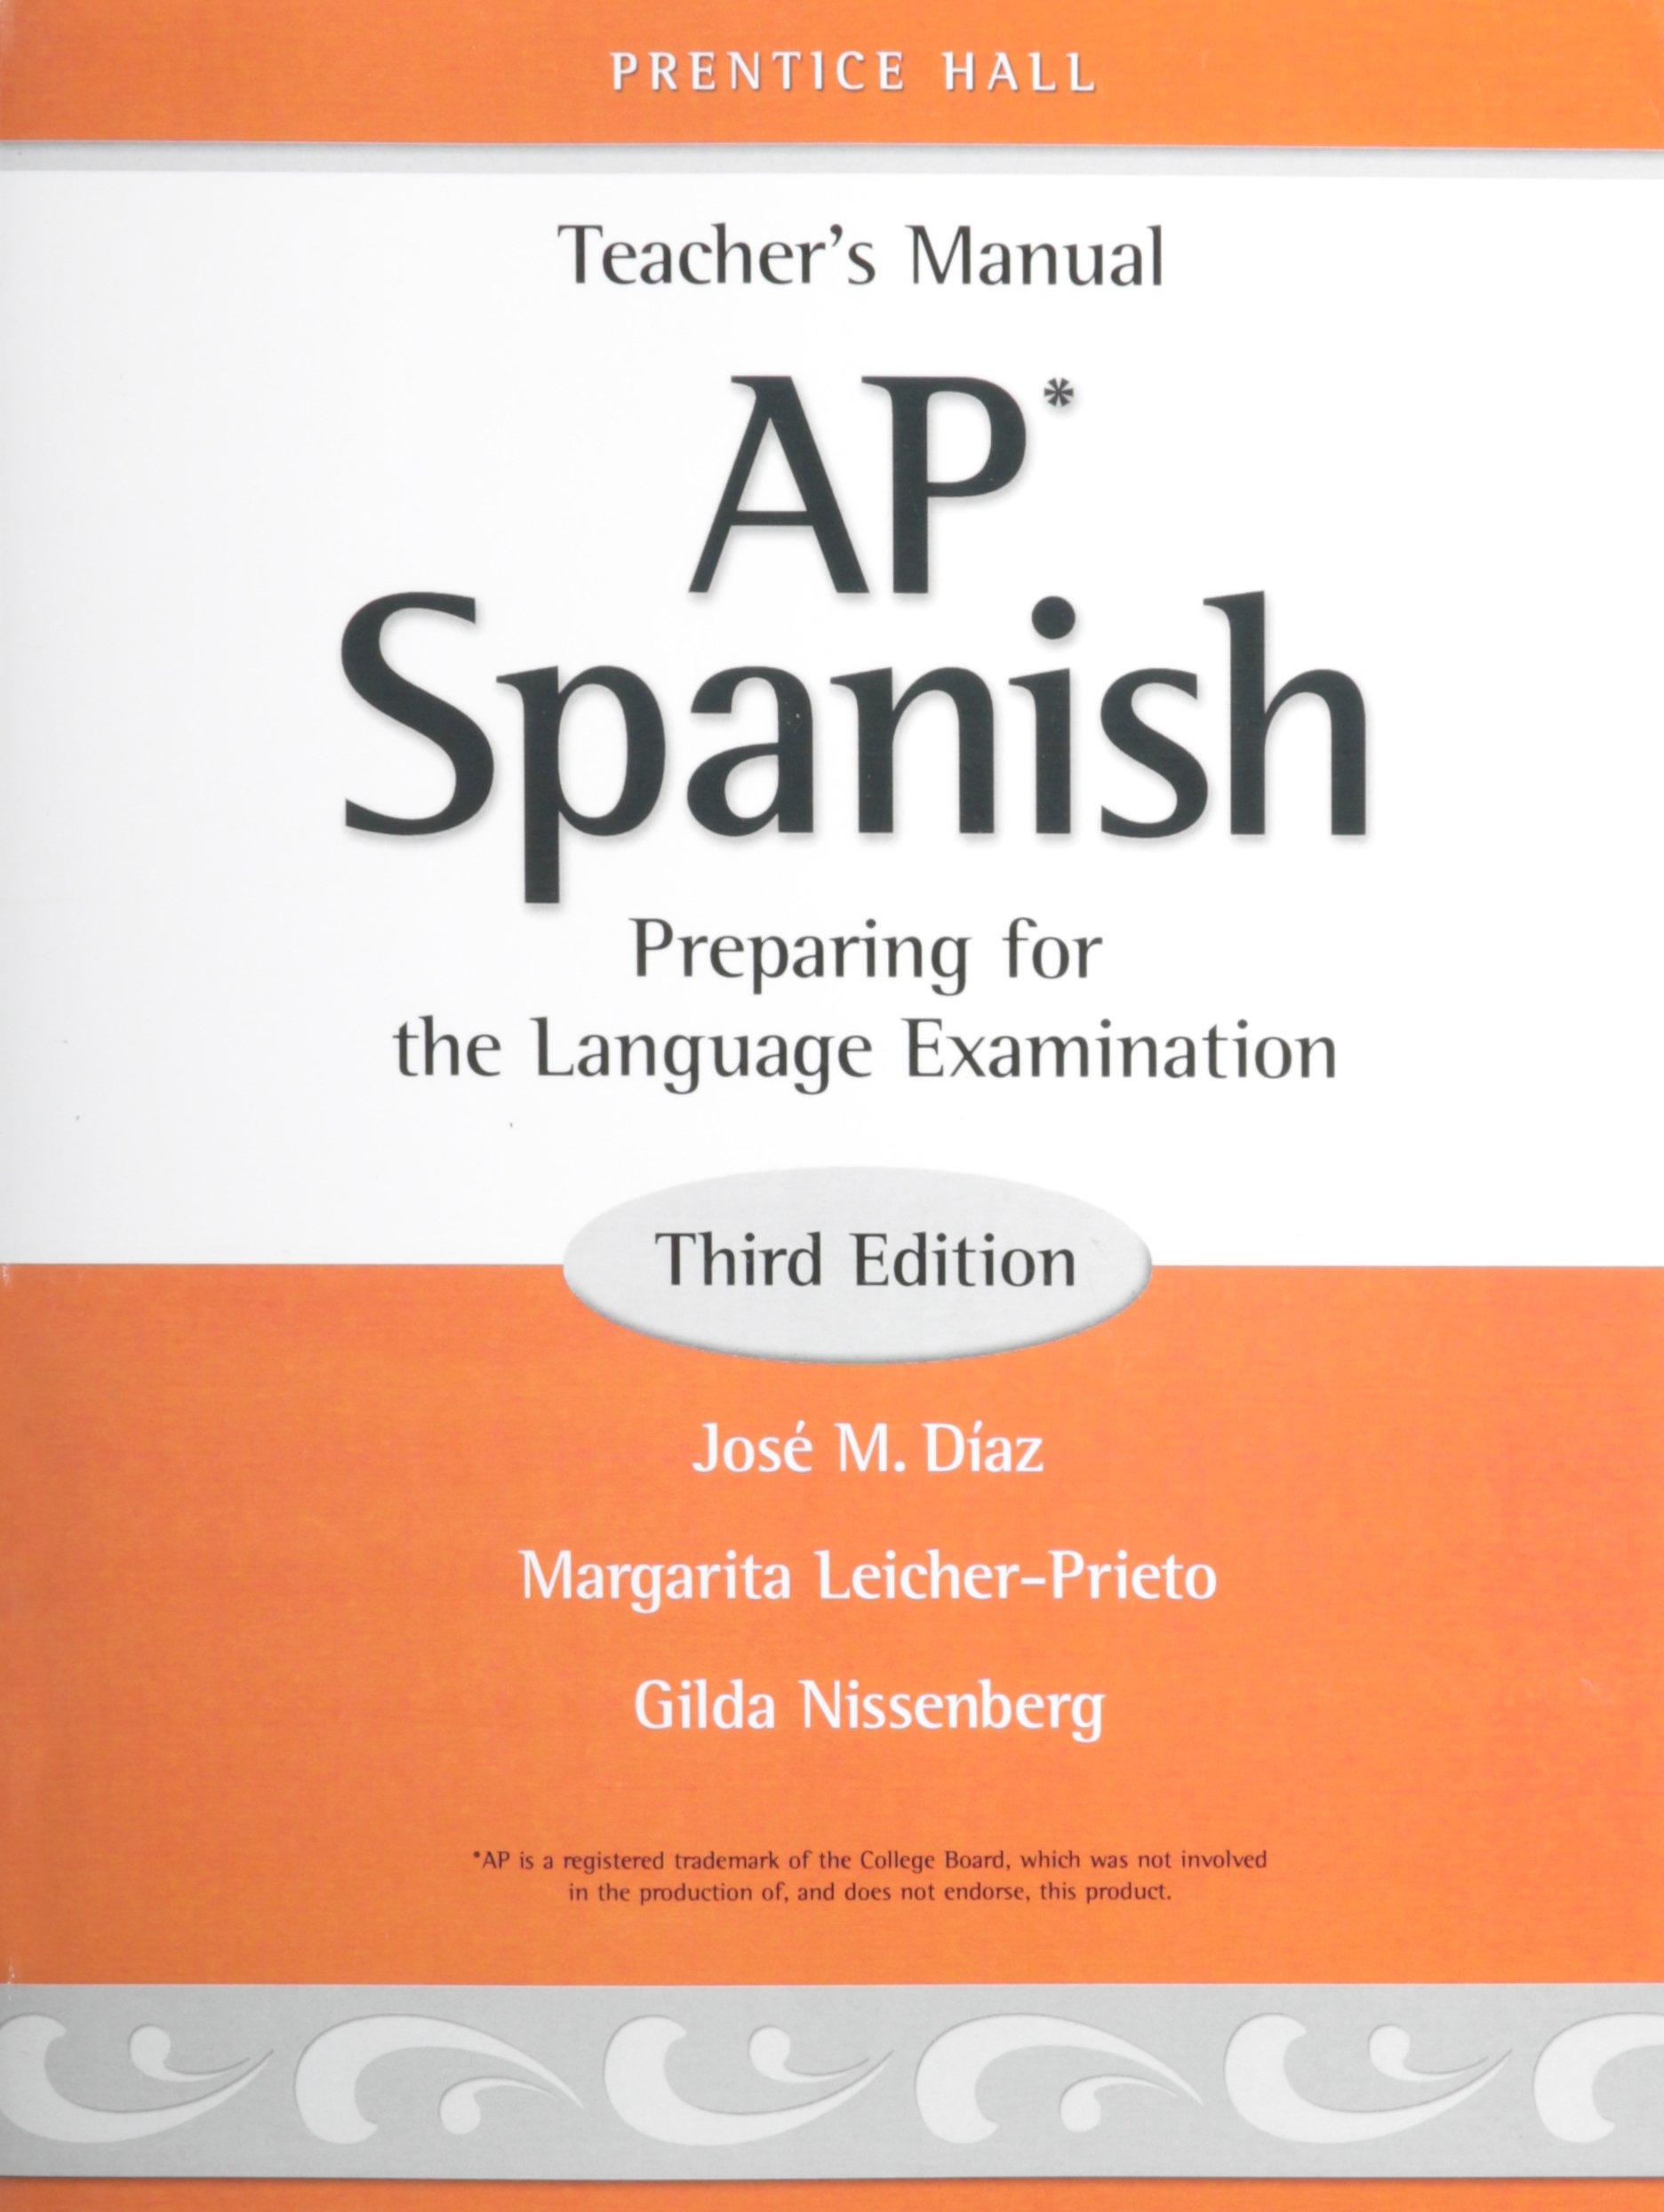 Ap spanish teachers manual pearson prentice hall 9780131660953 ap spanish teachers manual pearson prentice hall 9780131660953 amazon books fandeluxe Image collections